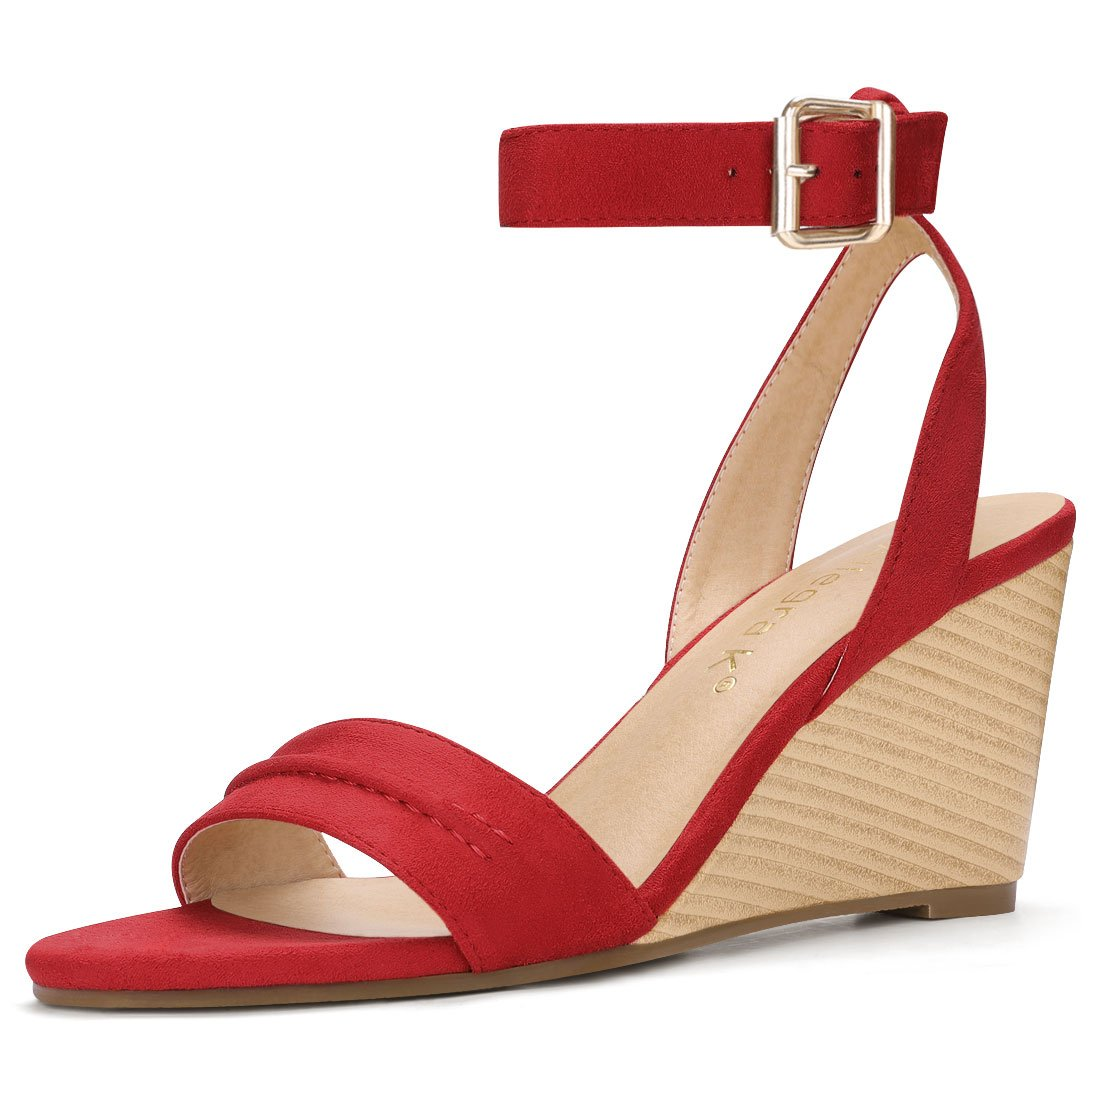 Allegra K Women's Cutout Tie-up Wedge Sandals g17051600ux0029